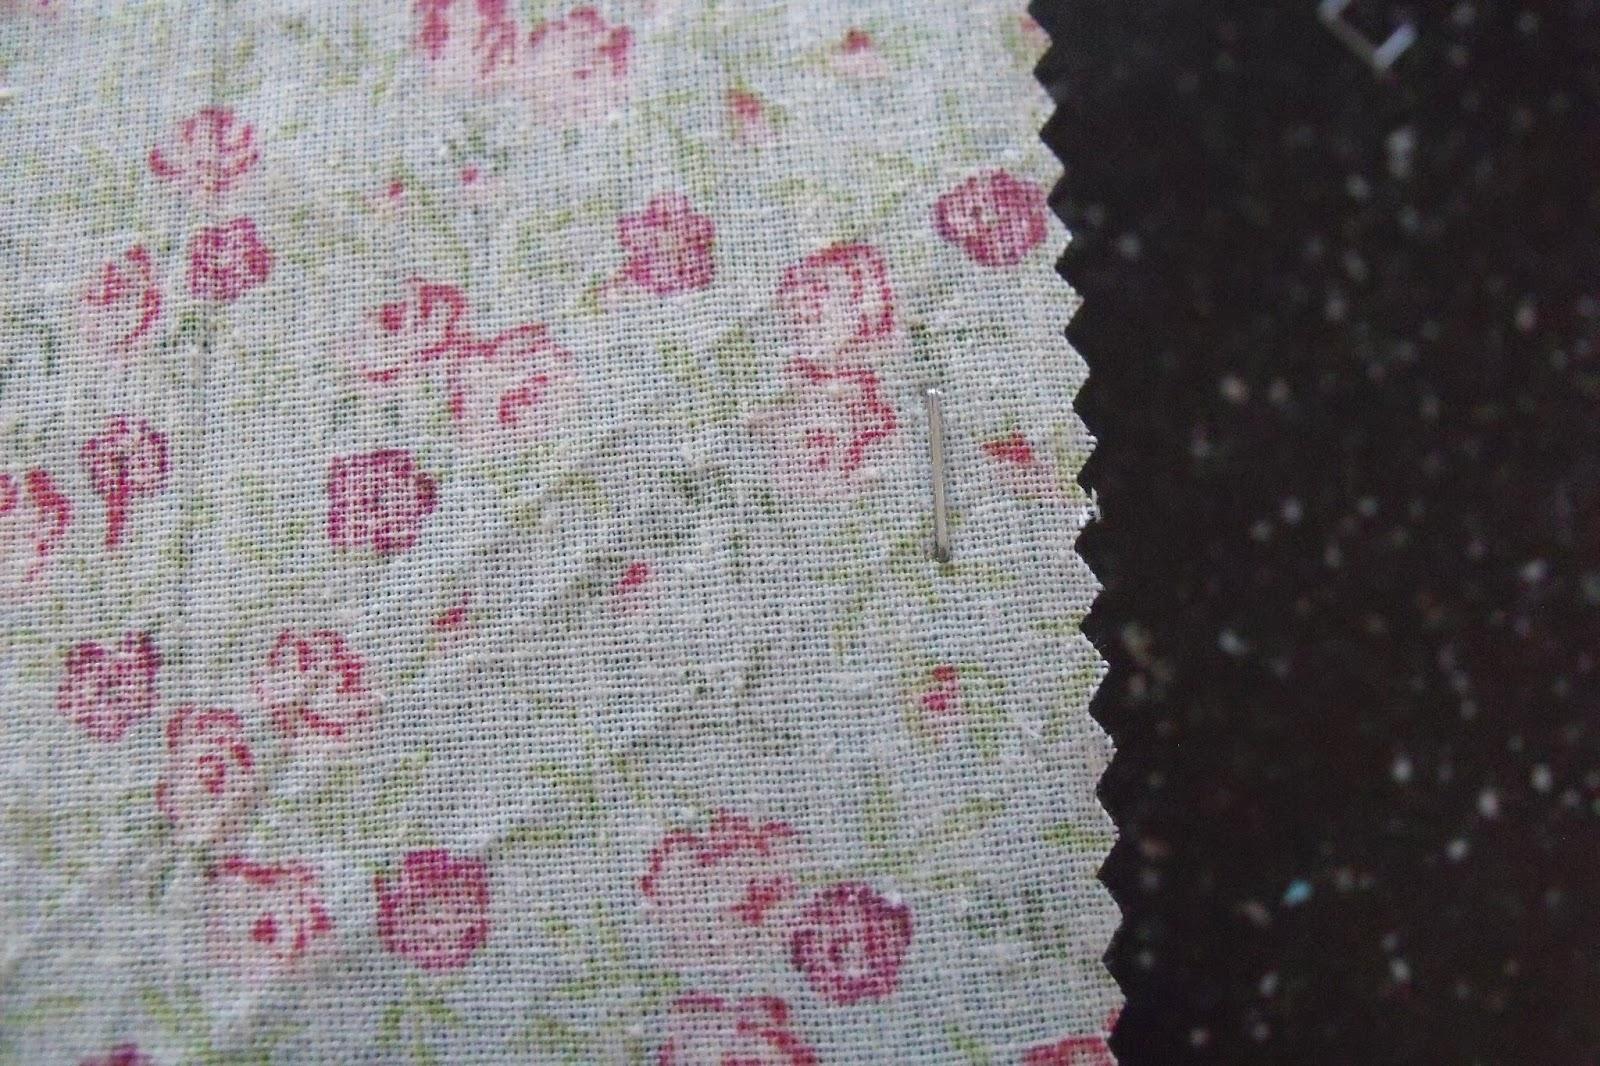 lili joue maman bricole customiser des cadres avec du tissu. Black Bedroom Furniture Sets. Home Design Ideas